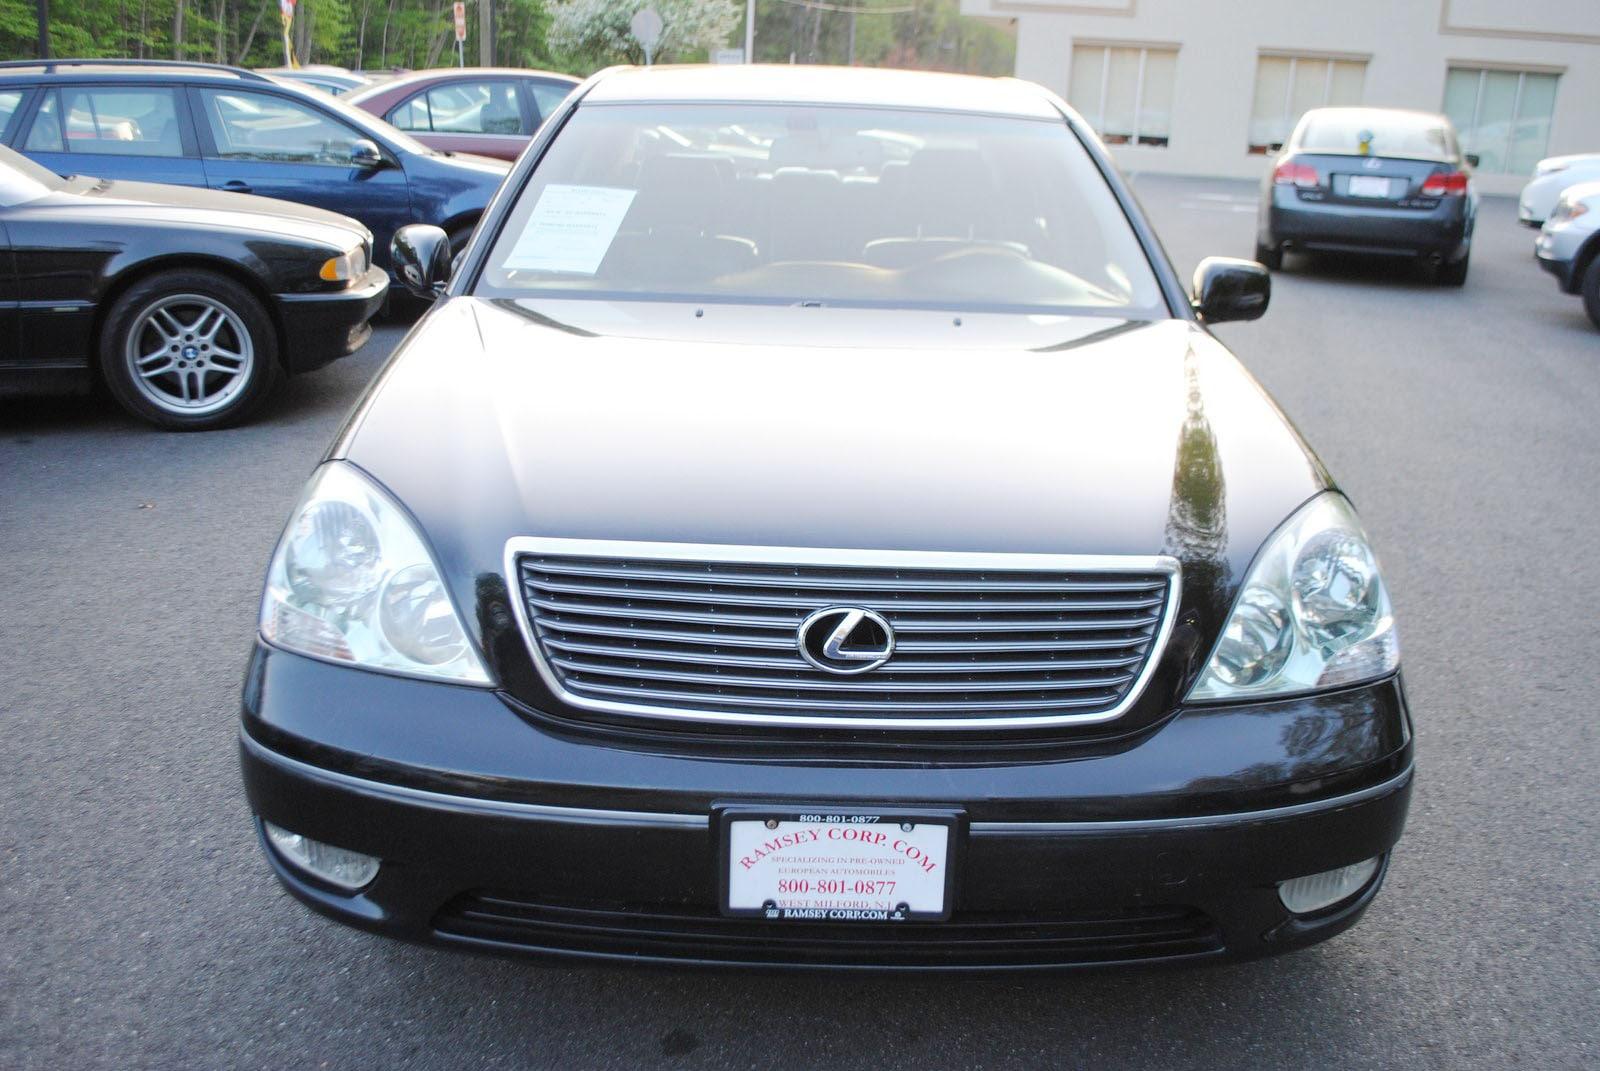 Used 2001 Lexus Ls 430 For Sale